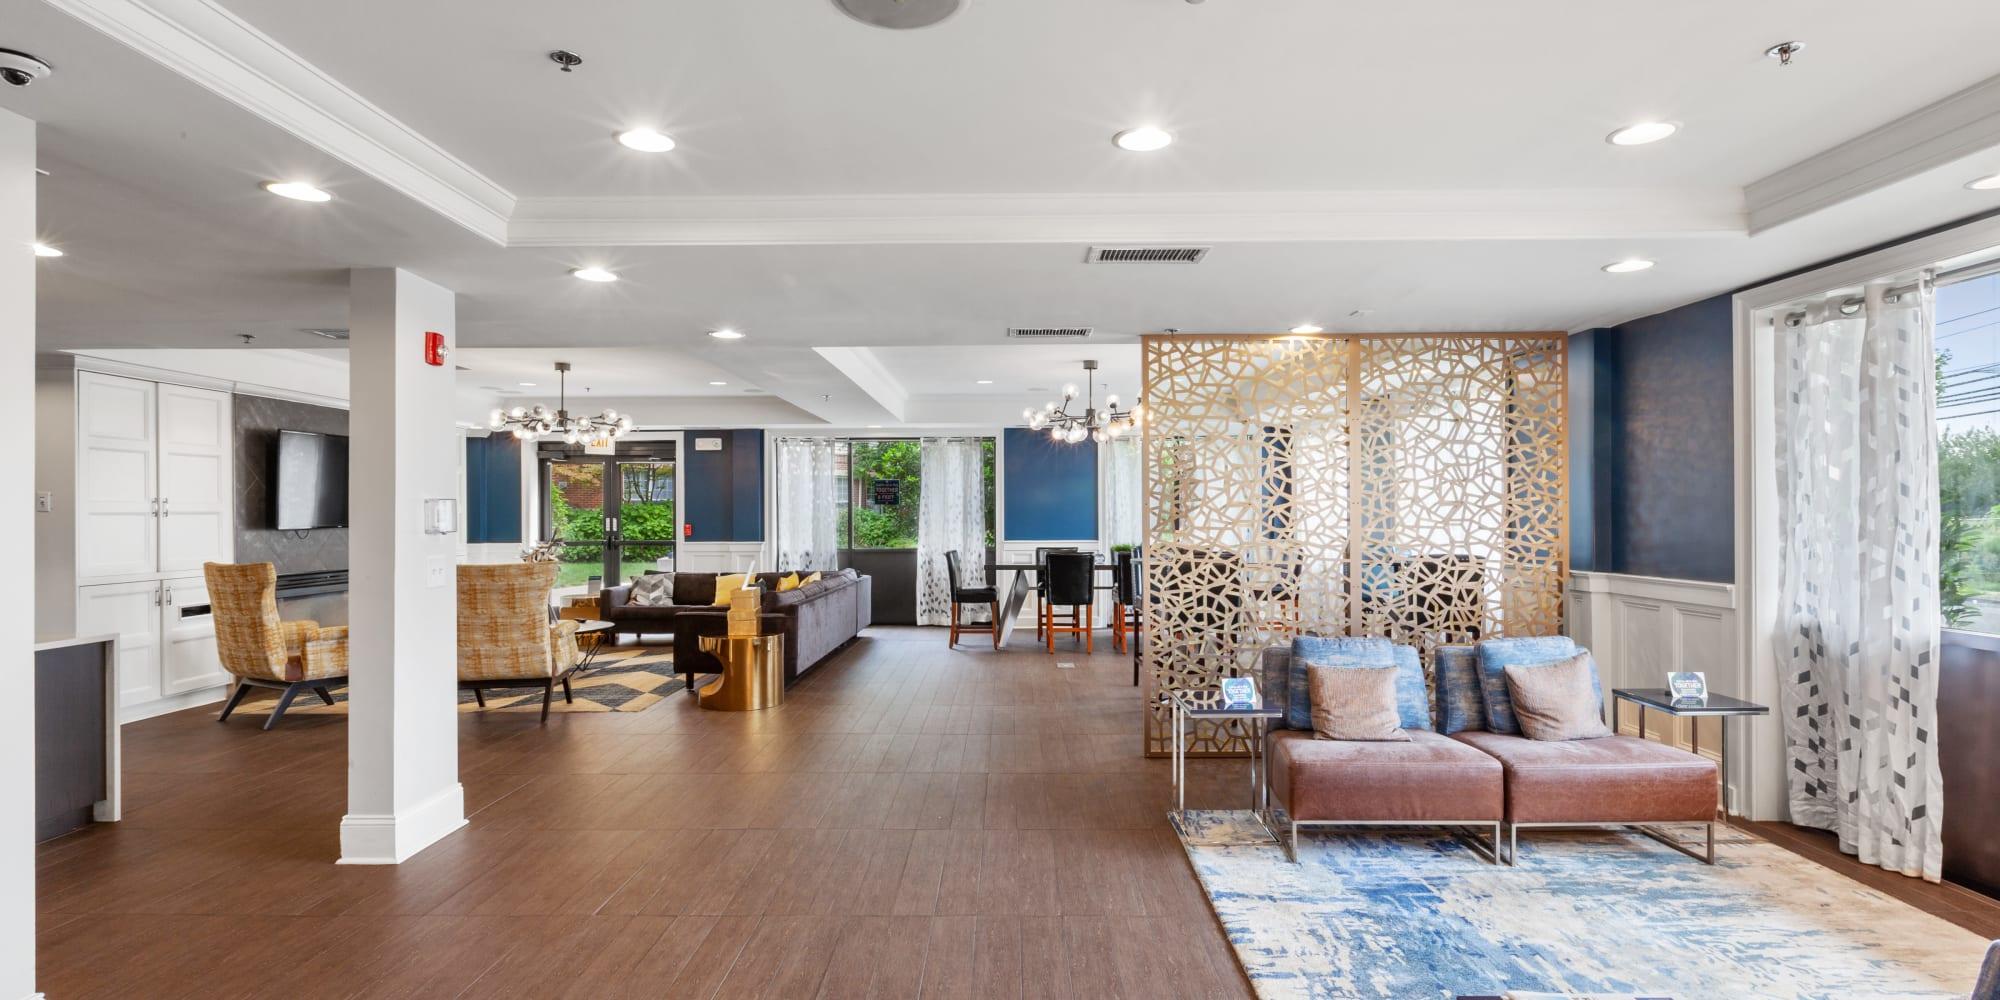 Sofi Lyndhurst Apartments in Lyndhurst, New Jersey